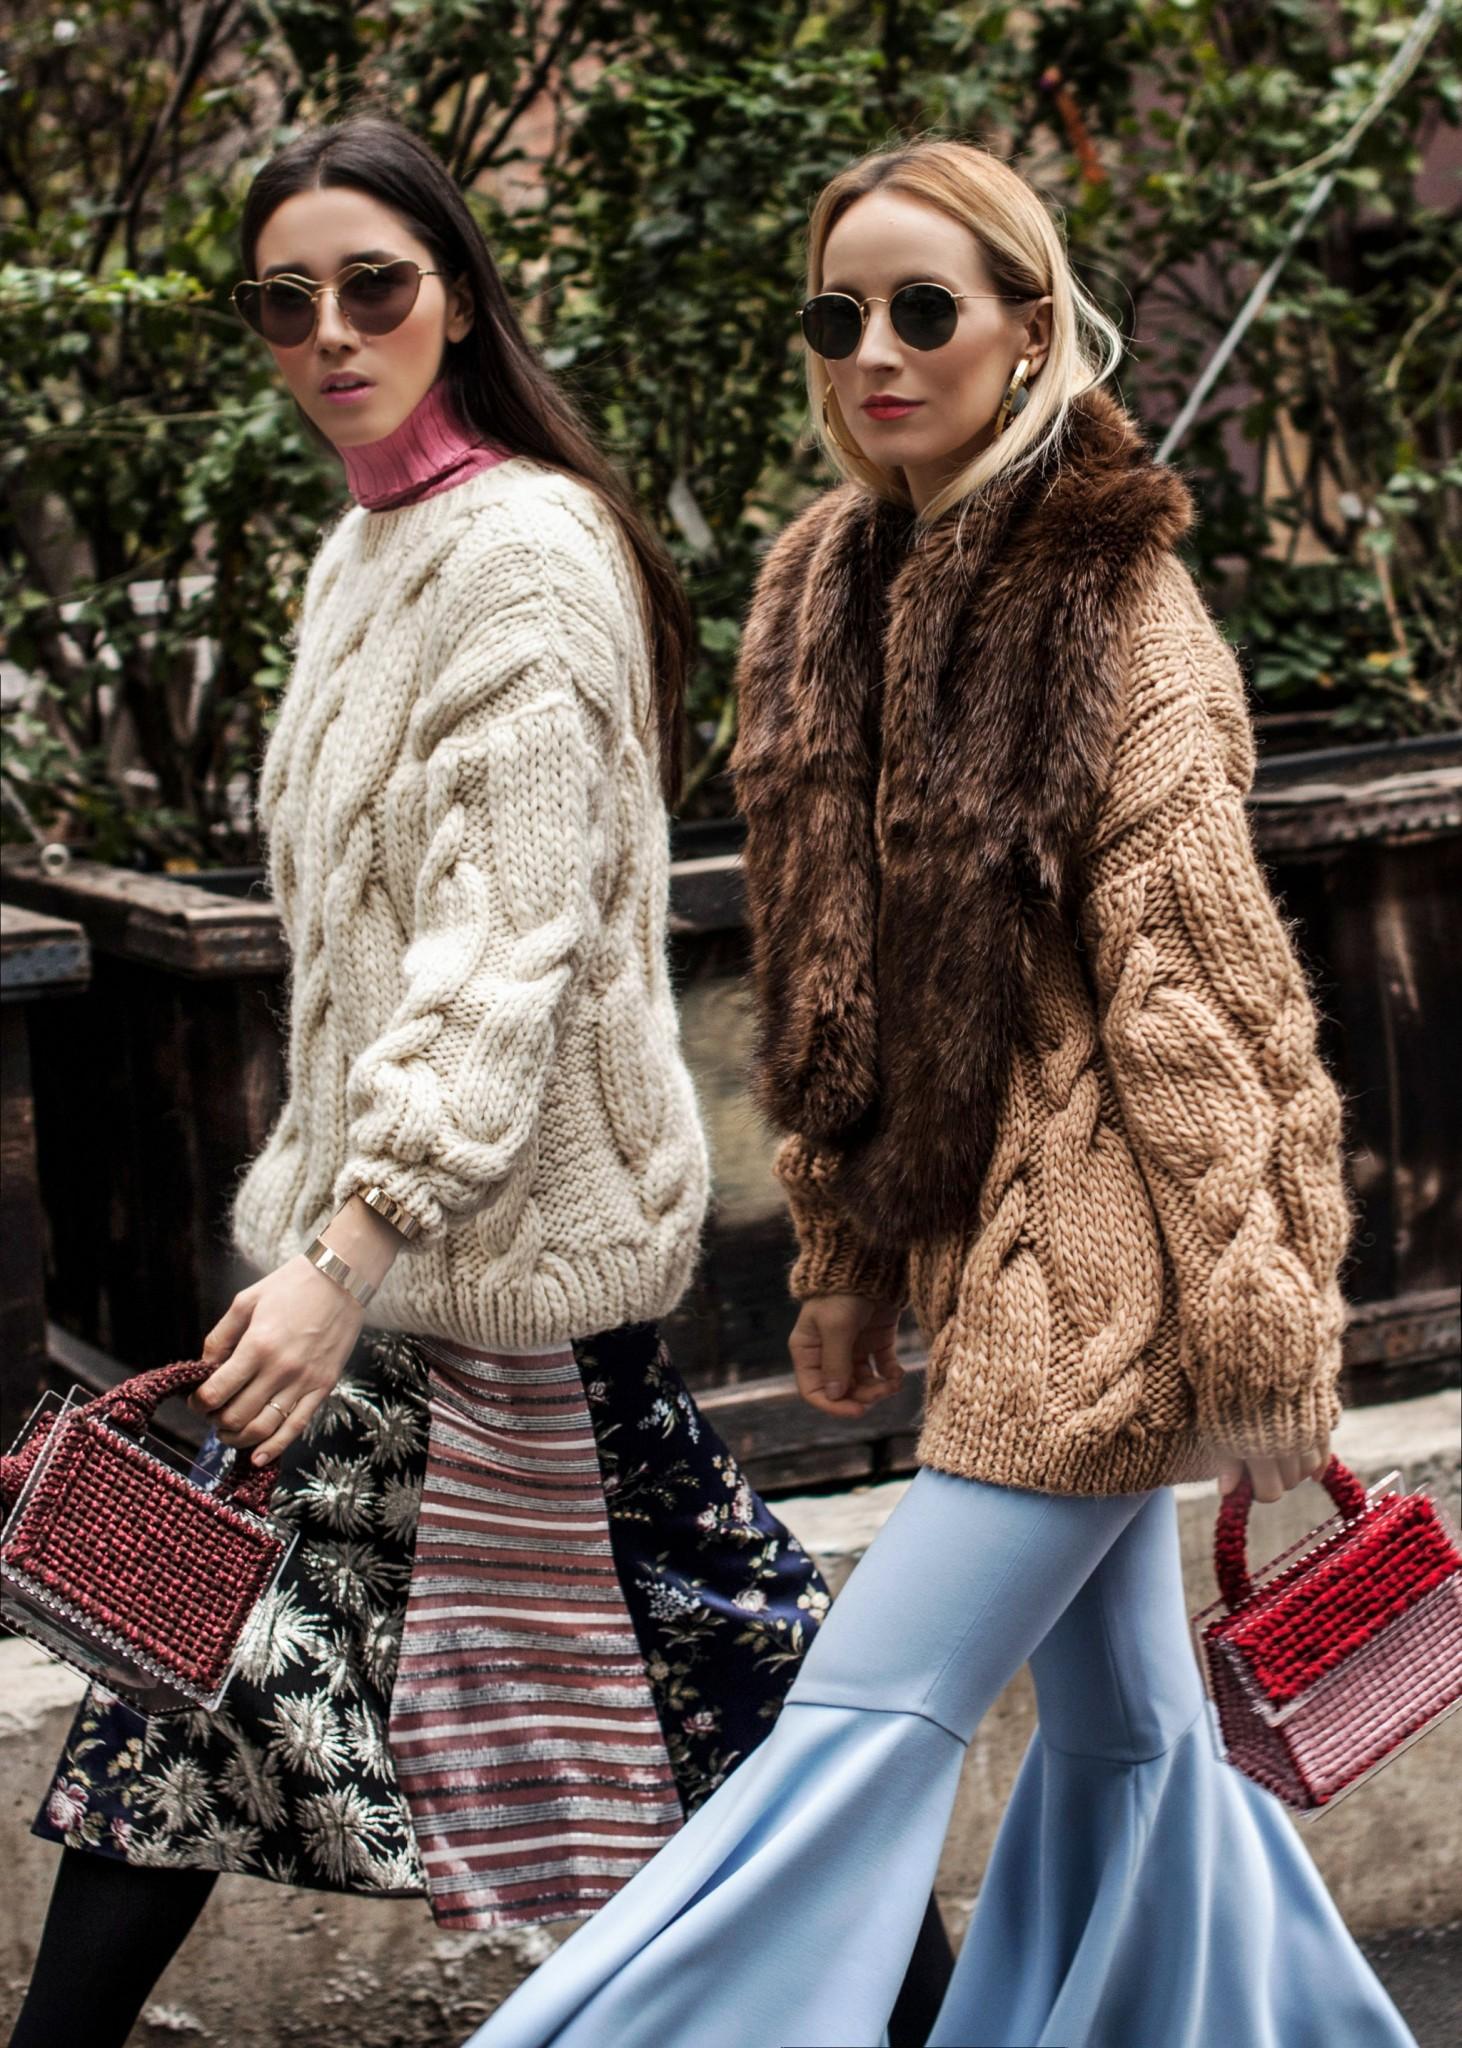 6tbilisi_fashionweek_fabulous_muses_diana_Enciu_Alina_tanasa